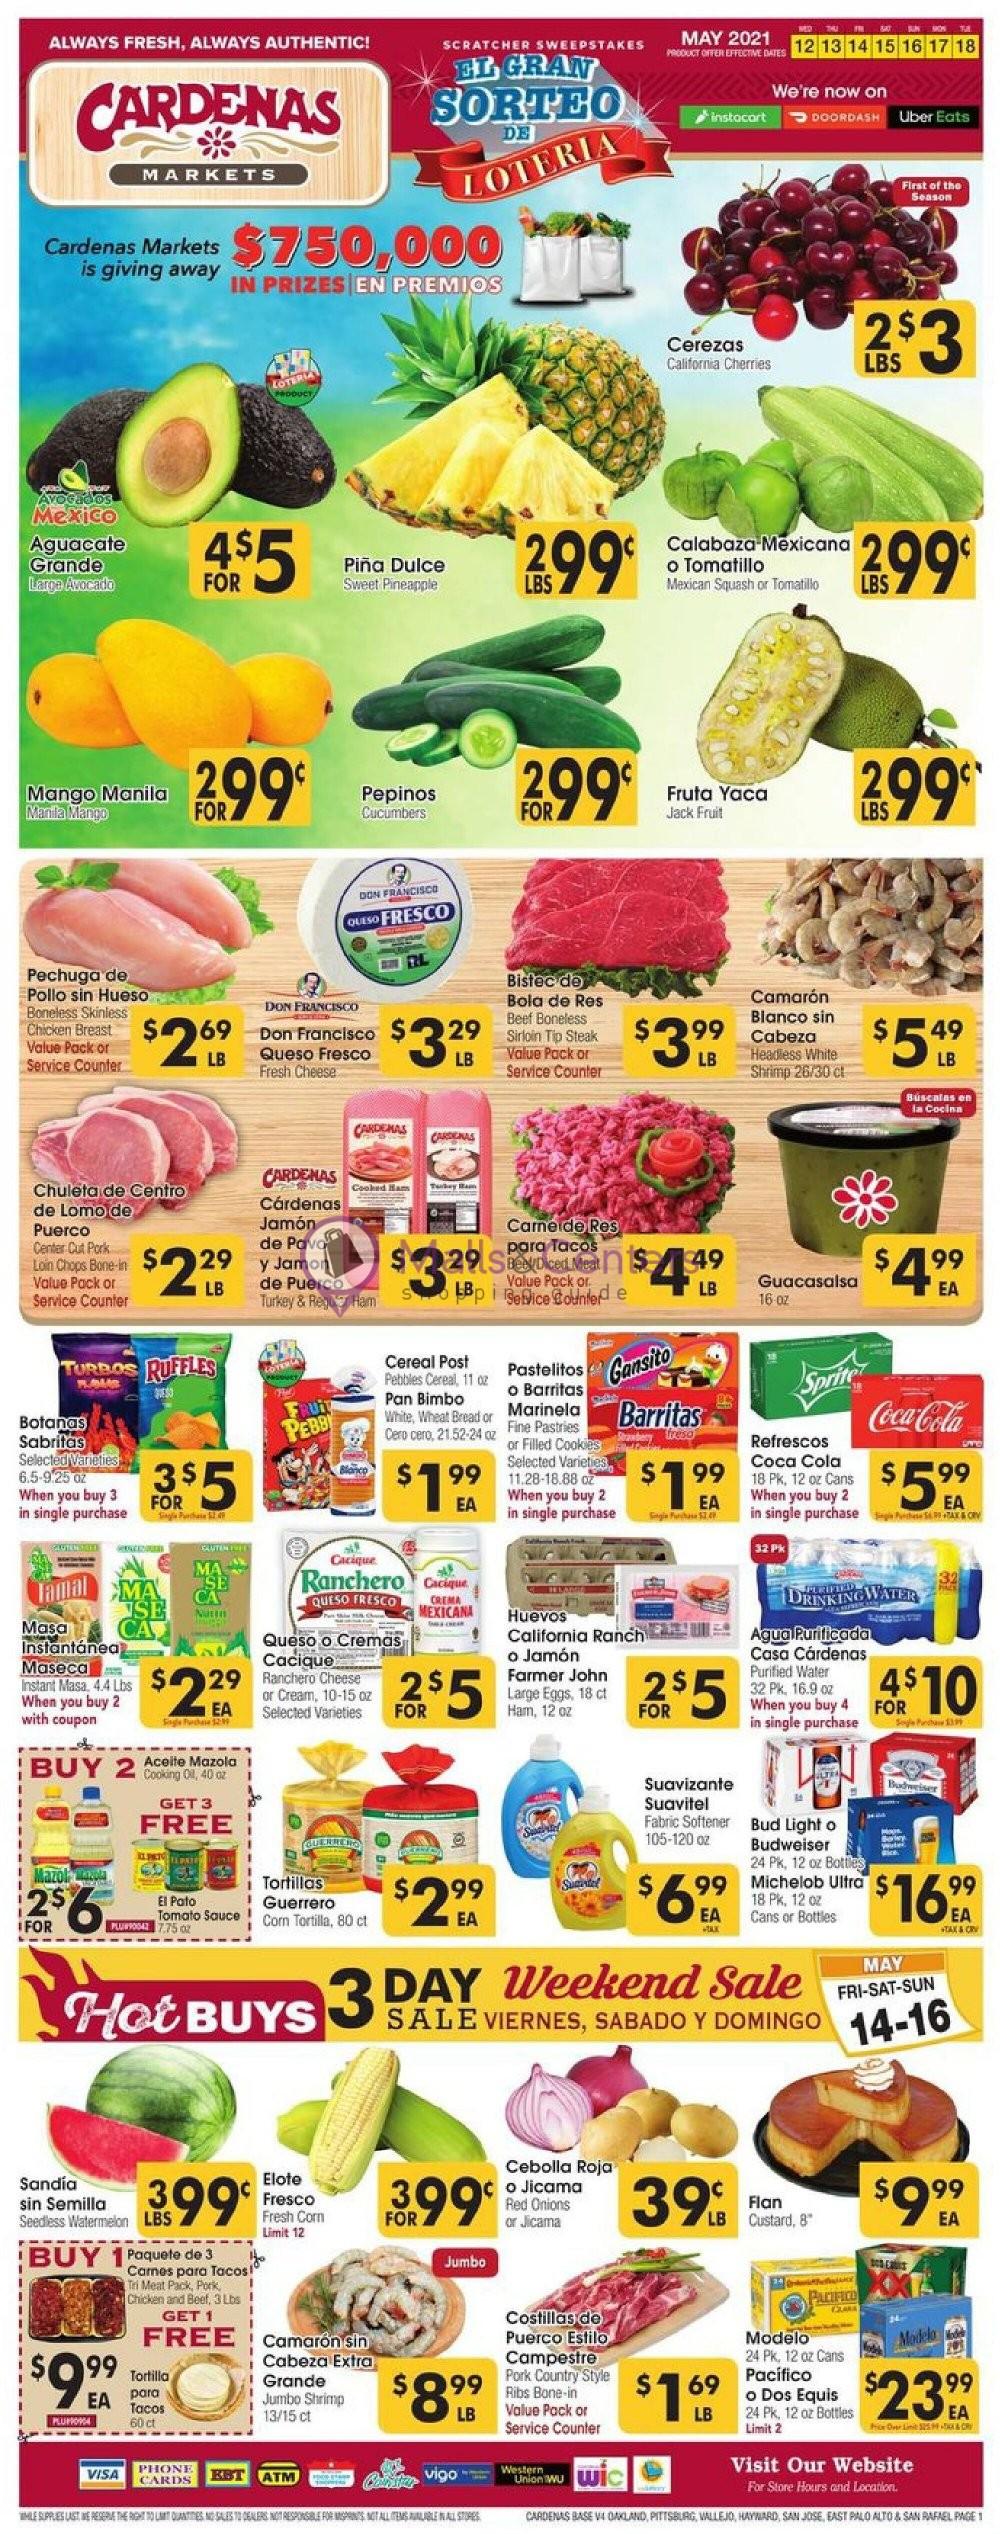 weekly ads Cardenas Market - page 1 - mallscenters.com